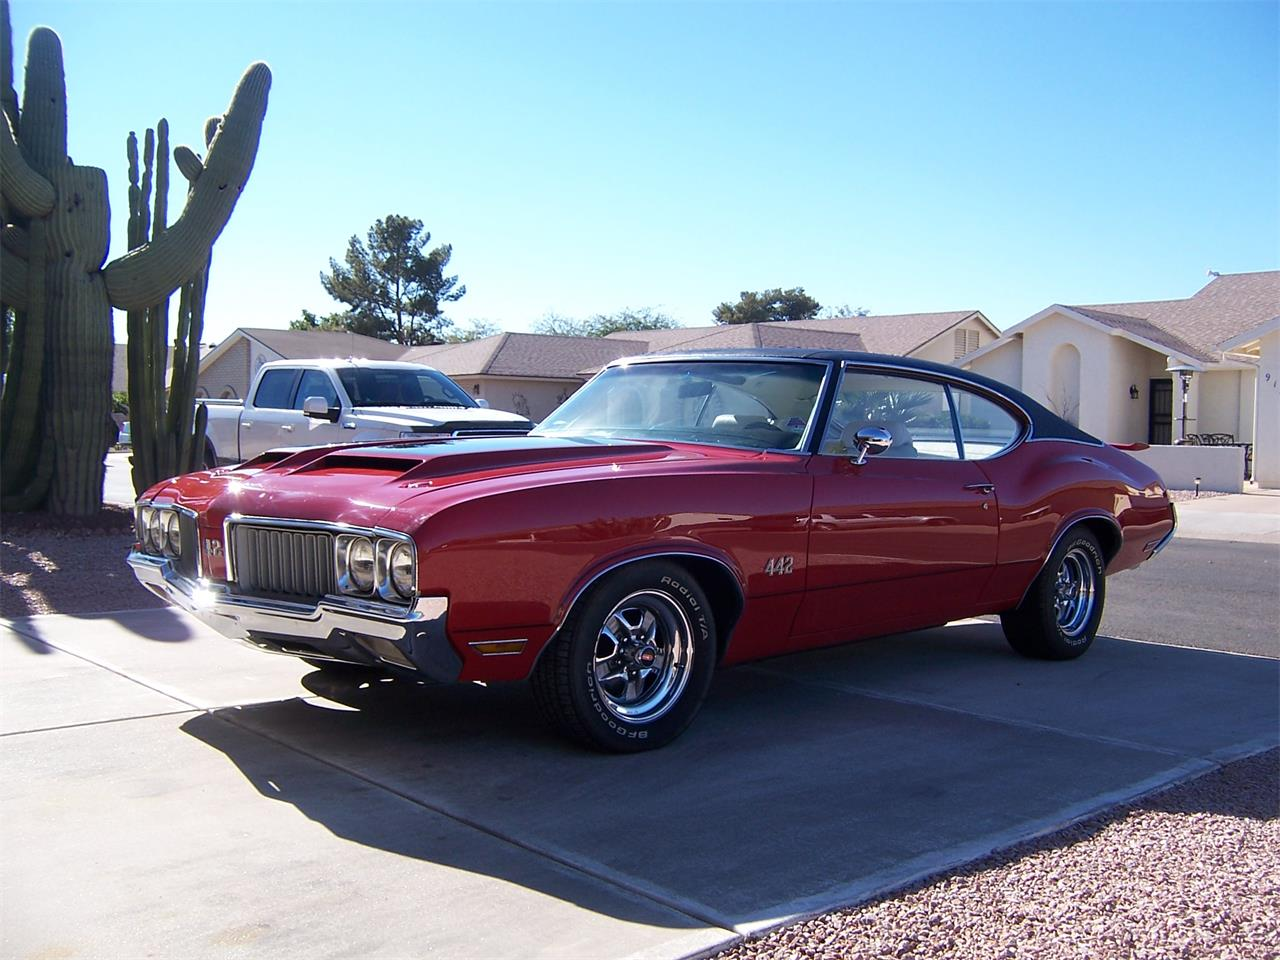 For Sale: 1970 Oldsmobile Cutlass in Mesa, Arizona